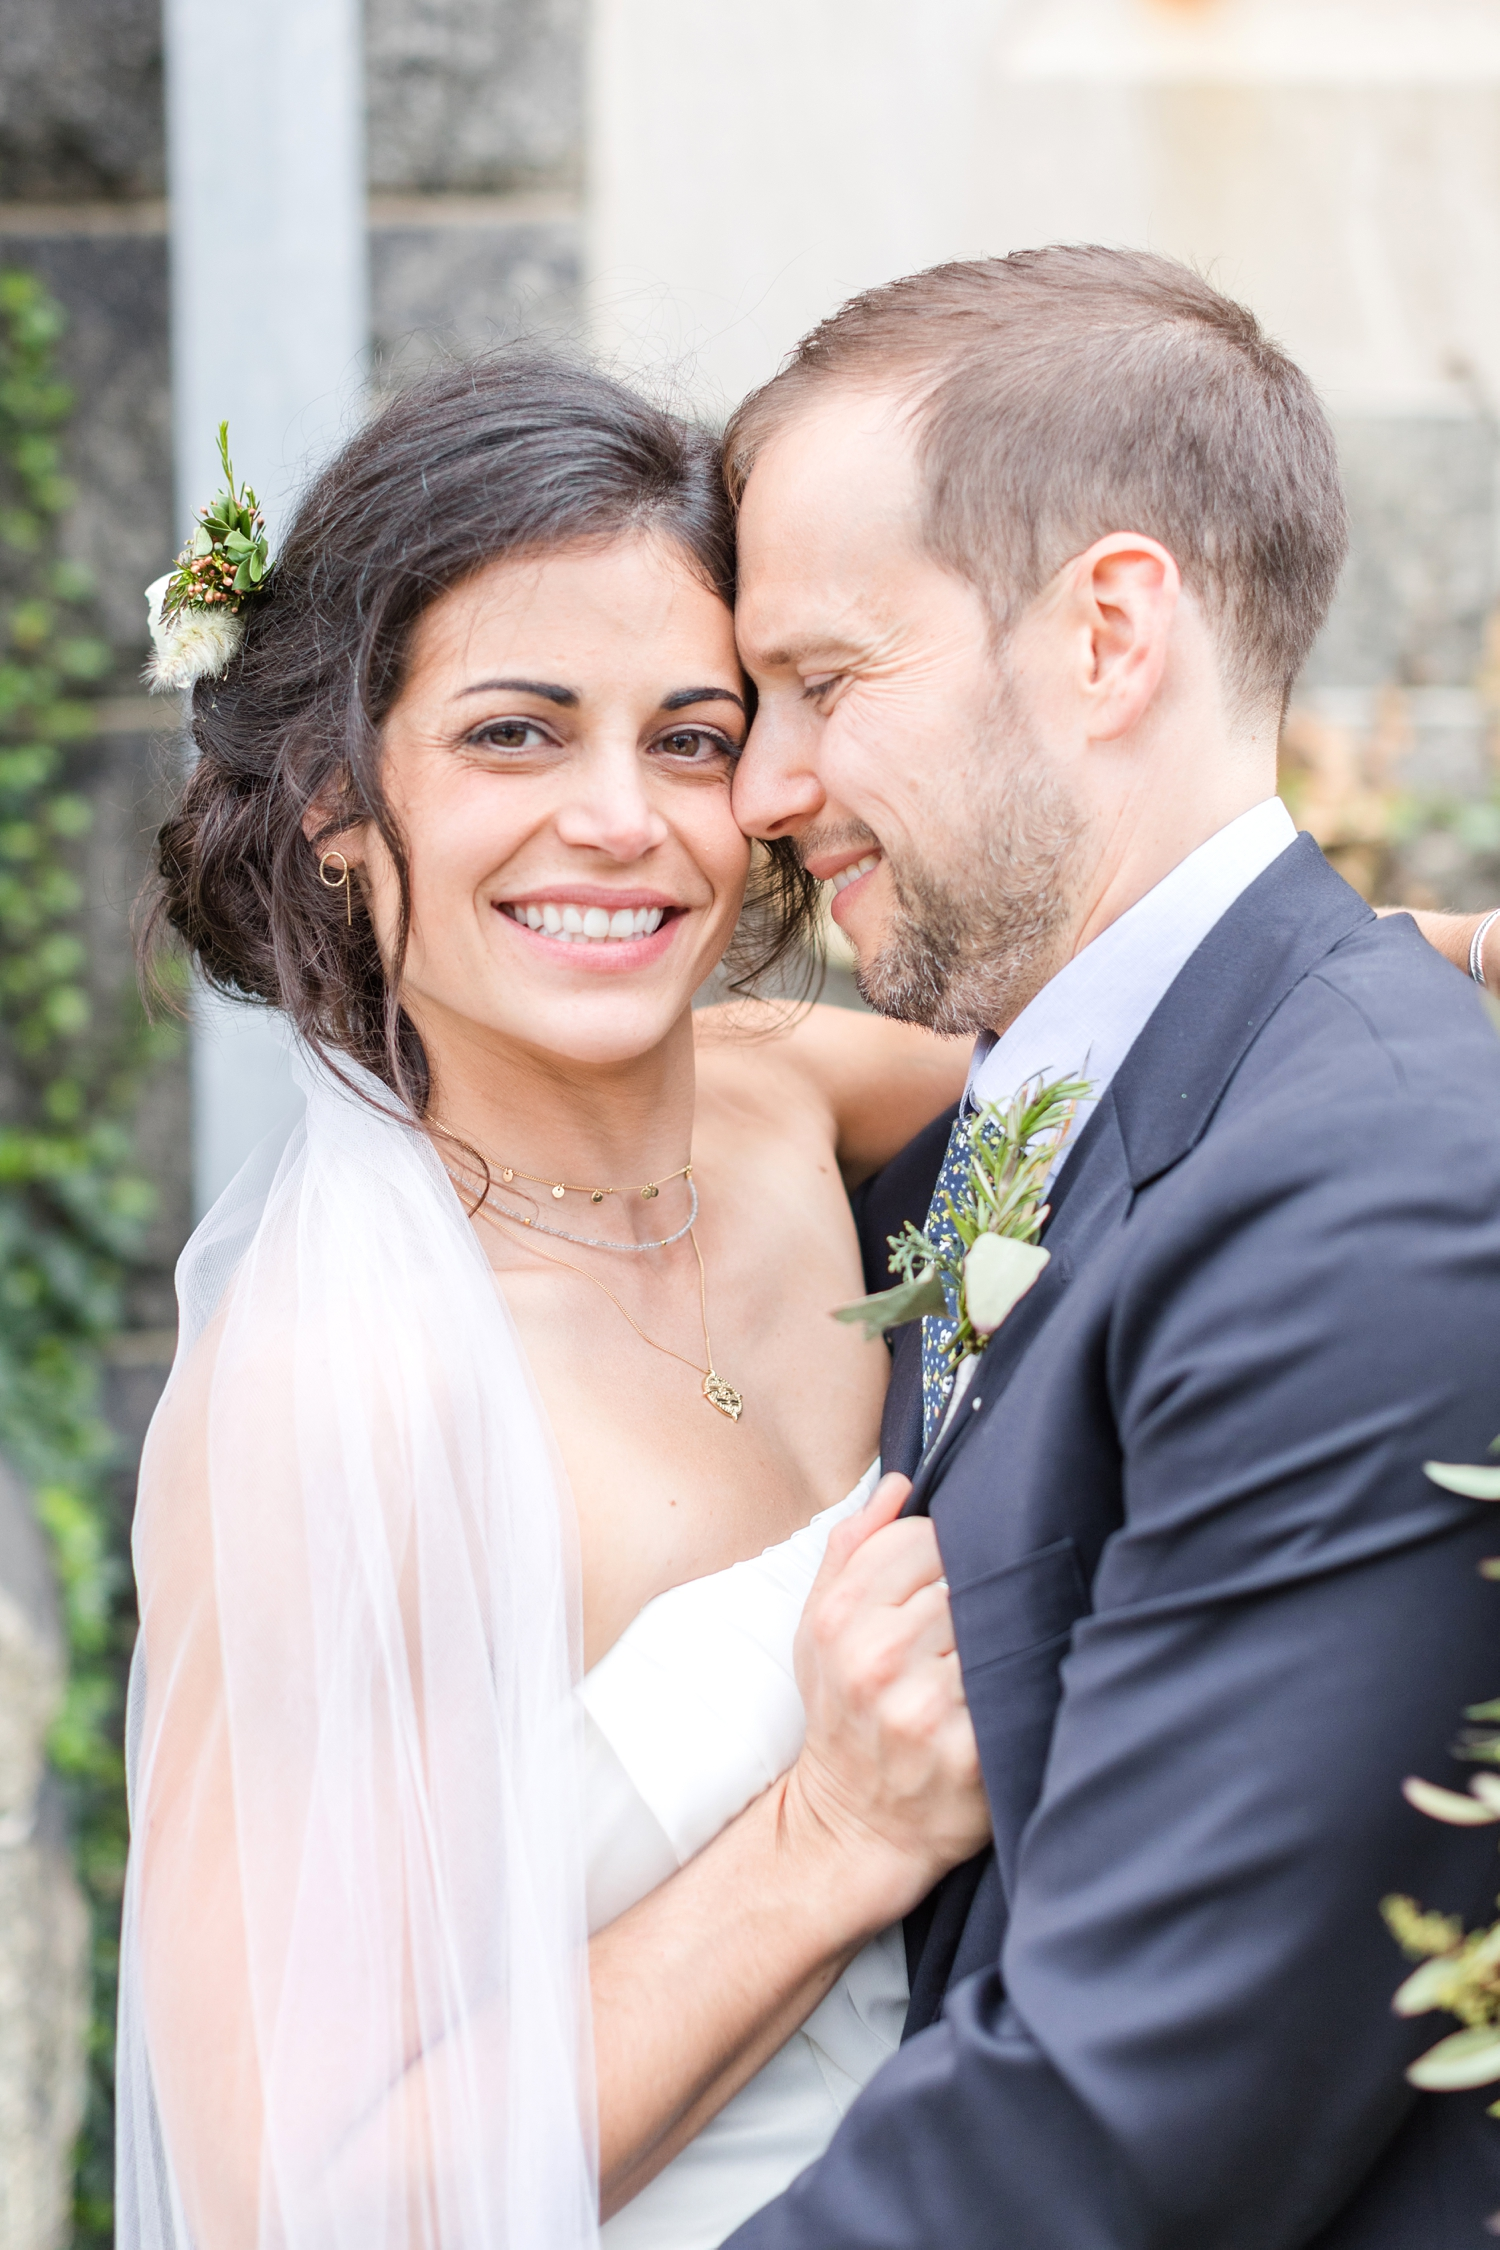 Matt & Angel Skarzynski Wedding WEDDING HIGHLIGHTS-181_2640-Space-wedding-Baltimore-Maryland-wedding-photographer-Patapsco-State-Park-engagement-anna-grace-photography-photo.jpg